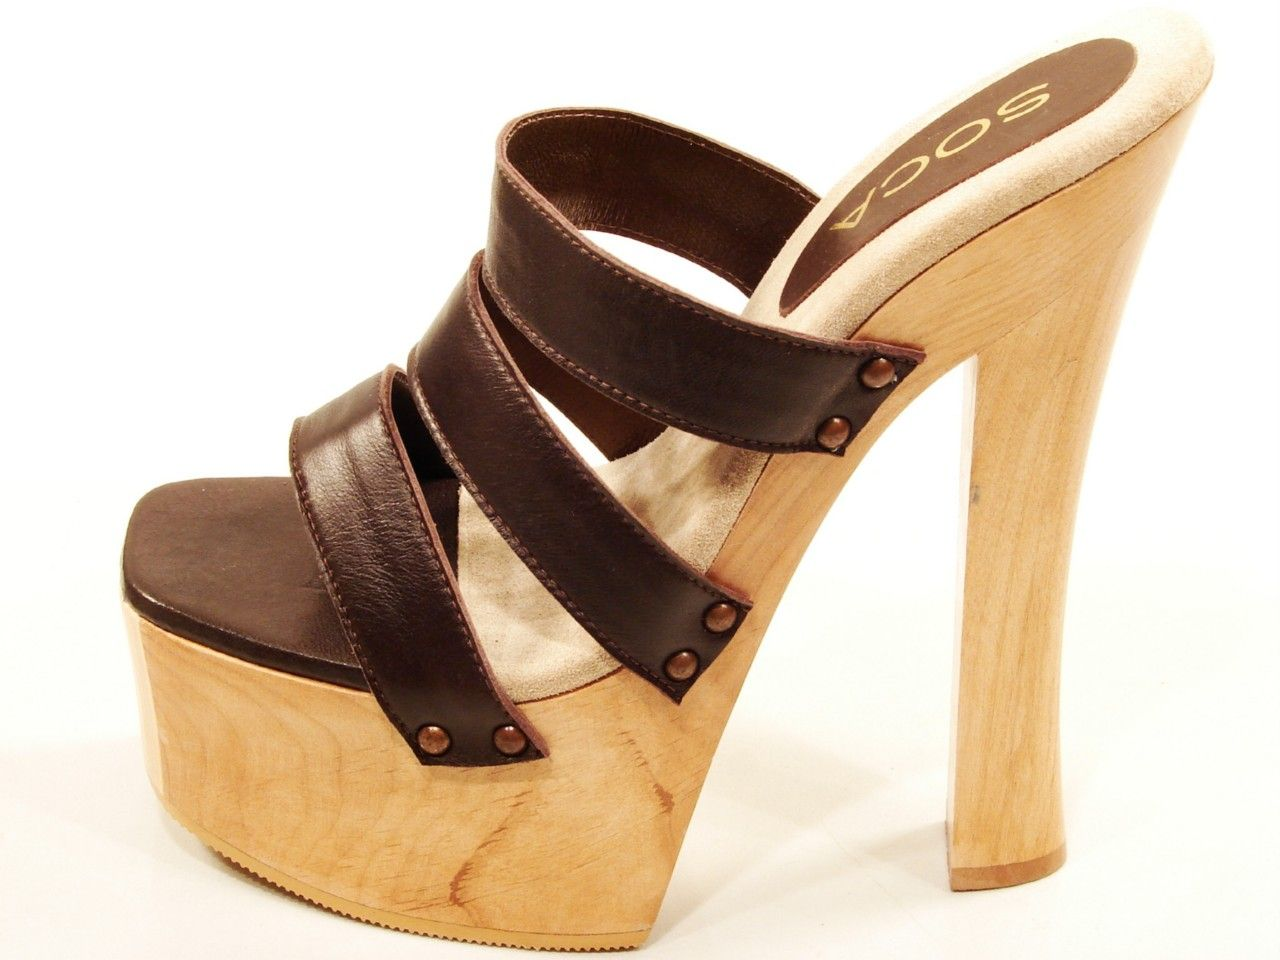 243a12c33e26 Soca Sandy Brown High Heel Wood Platform 3 Band Slip on Mules Sandals Clogs